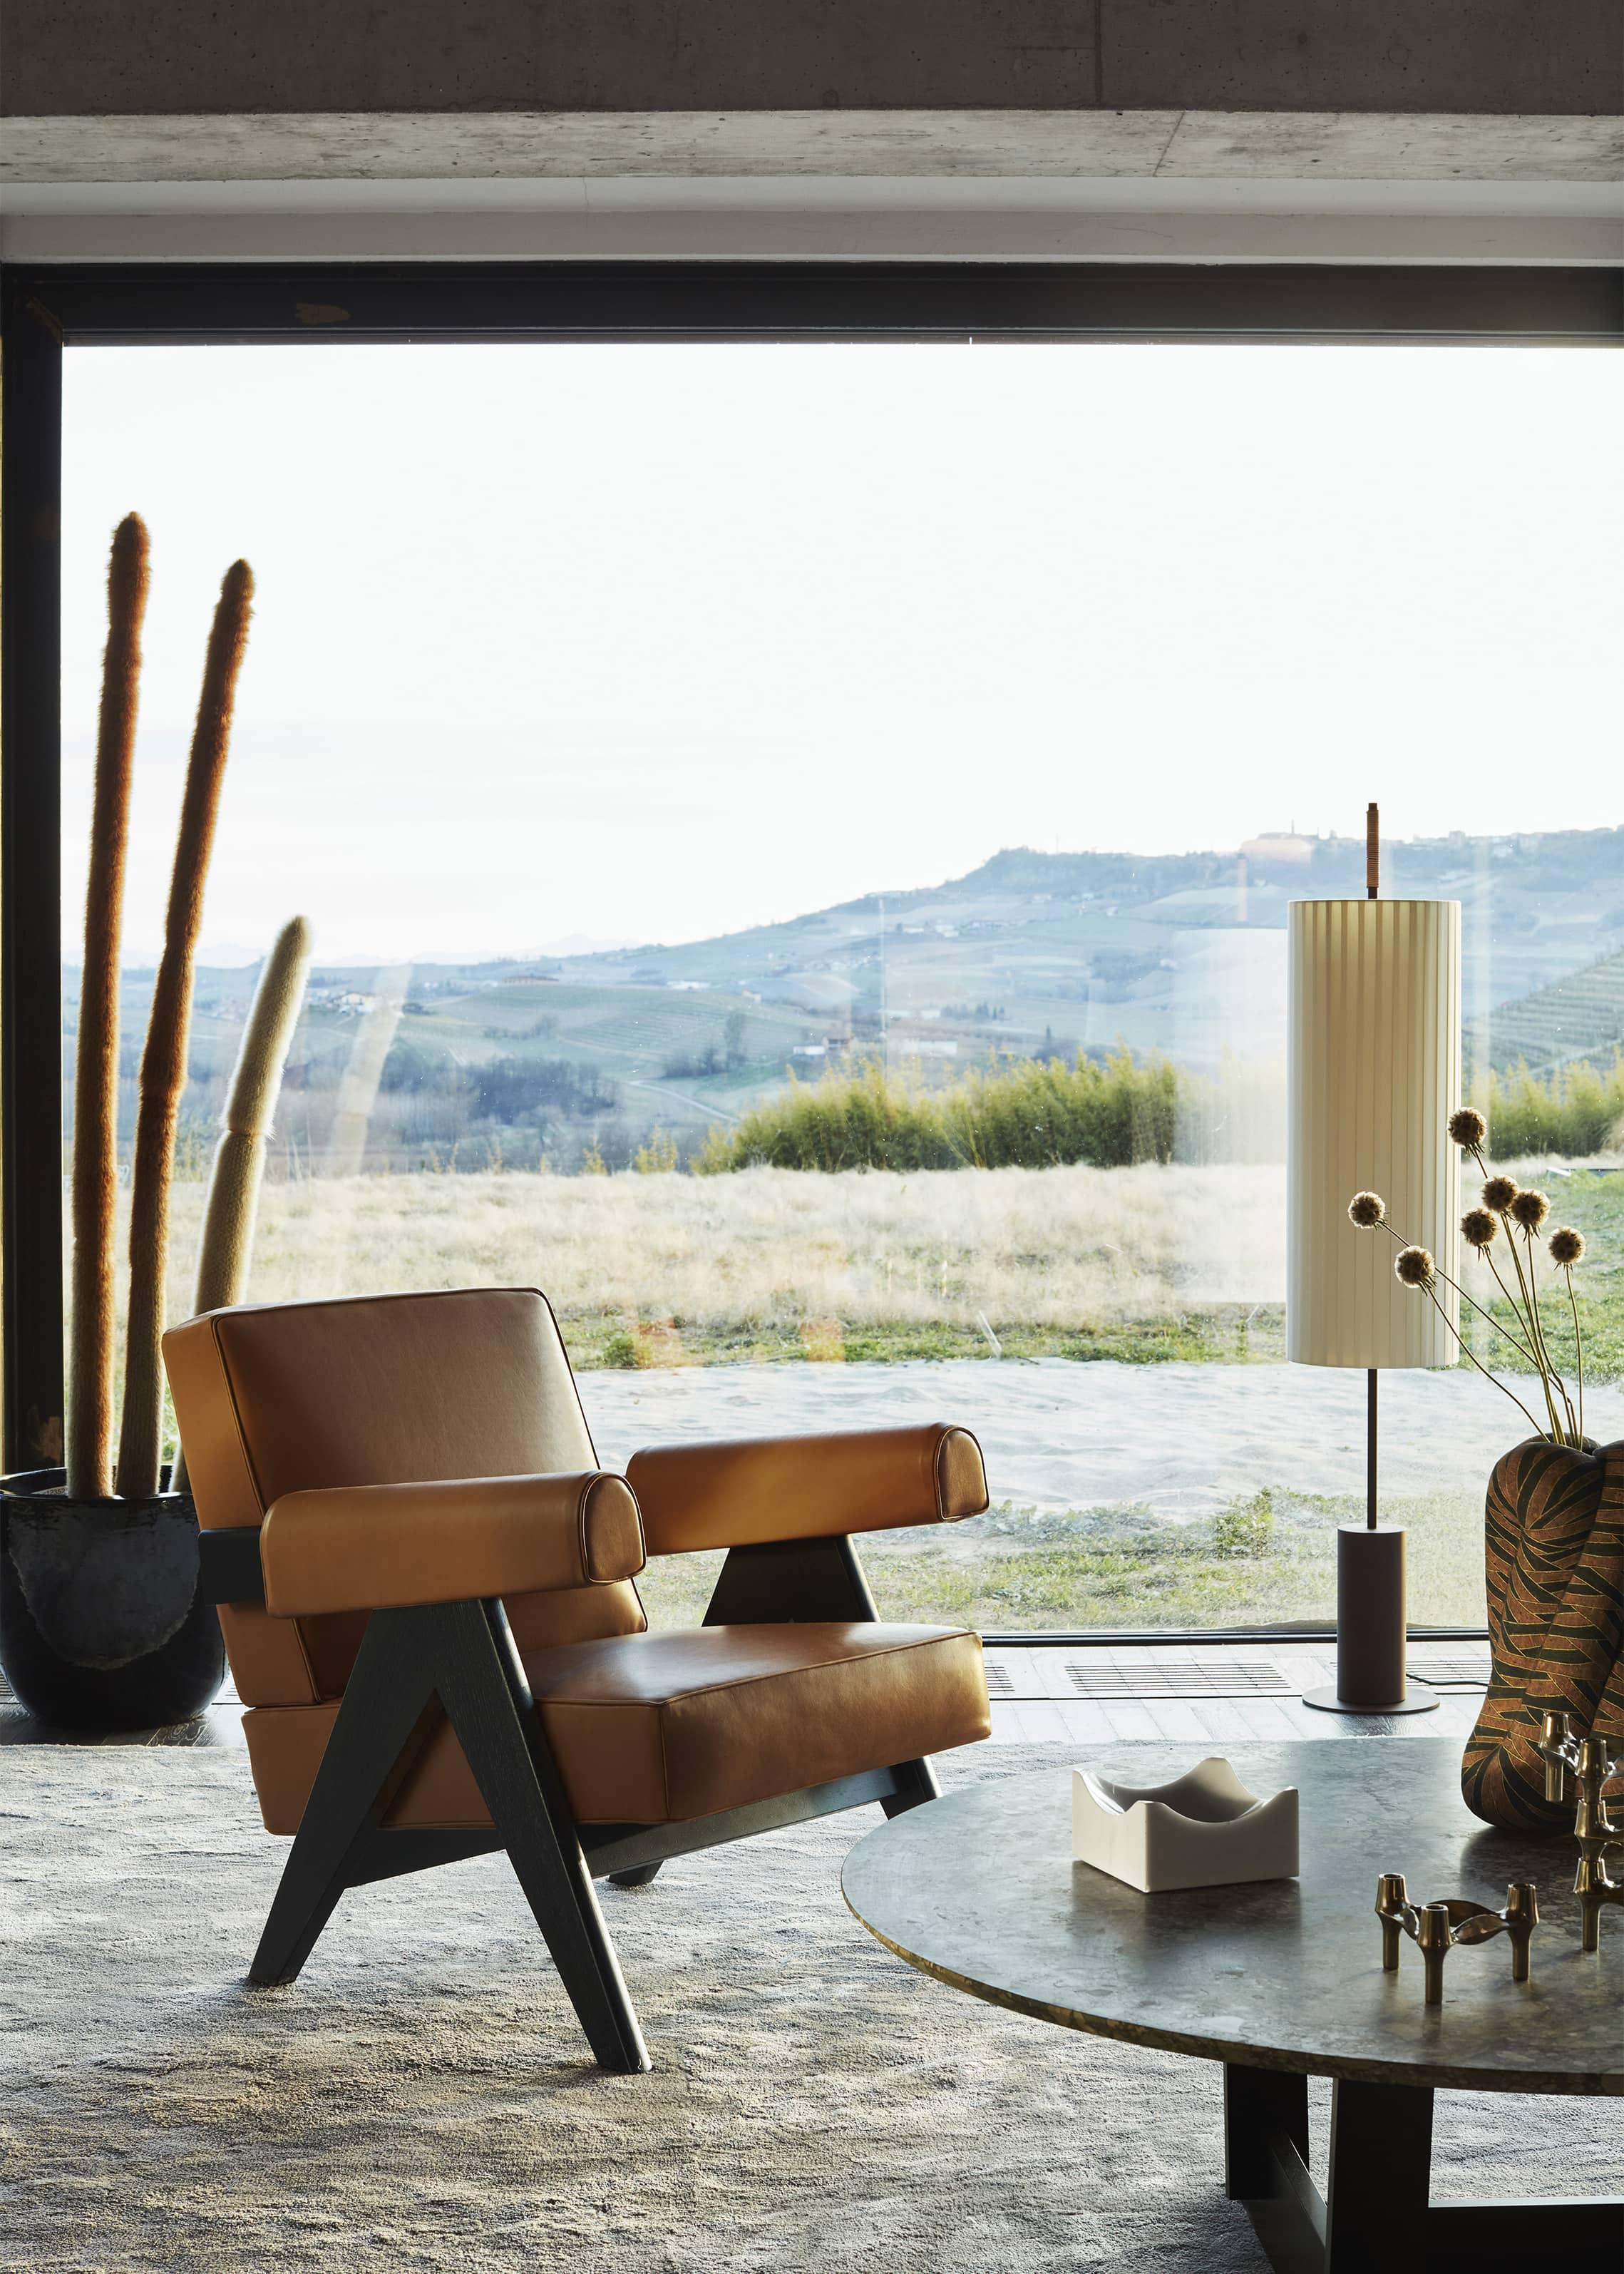 03_CASSINA_Capitol-Complex-Chair_Hommage-Pierre-Jeanneret_ph-C-DePasquale-Maffini_5